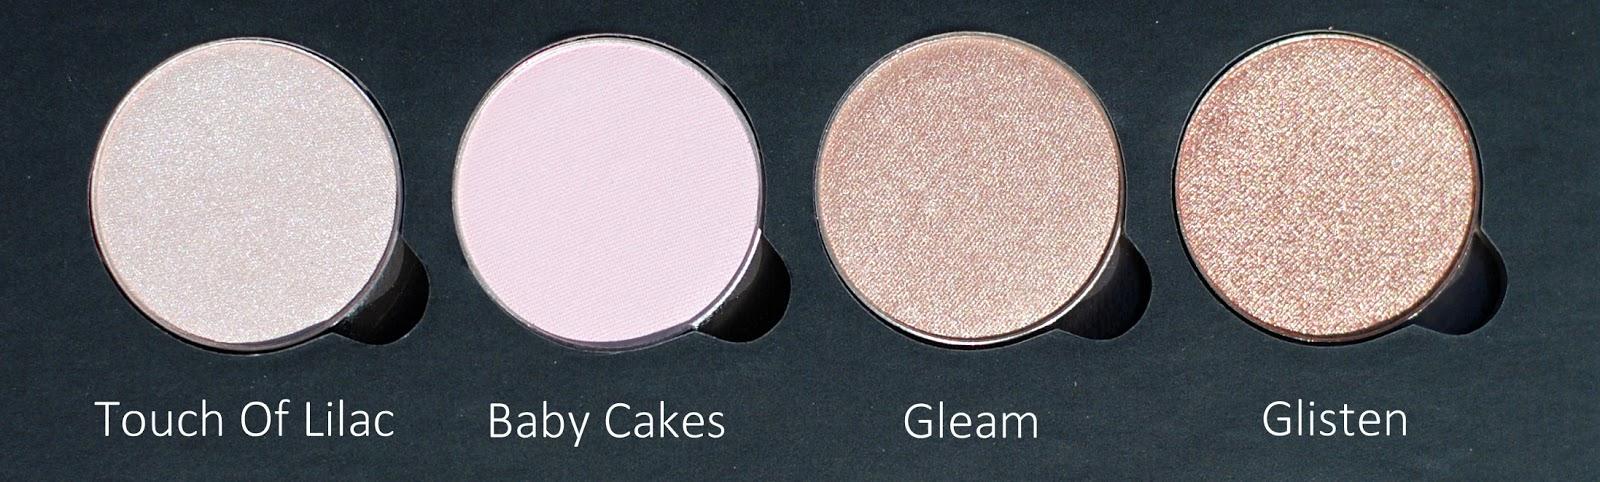 Abh Eyeshadow Baby Cakes